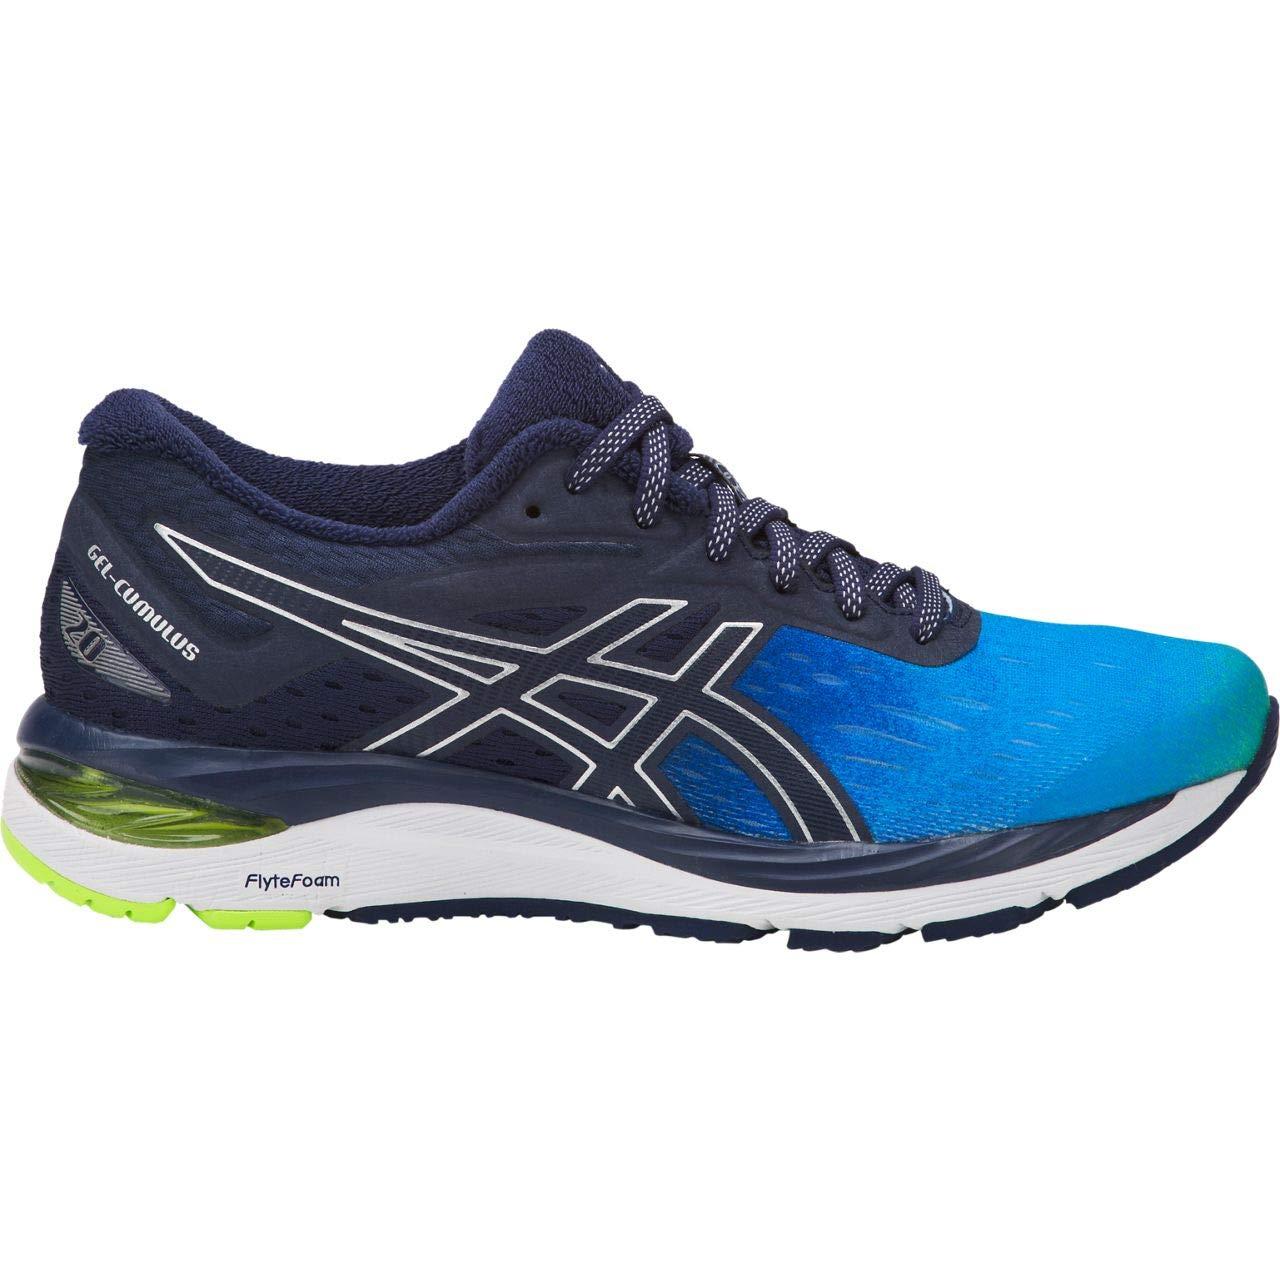 ASICS Gel-Cumulus 20 SP Shoe – Women s Running